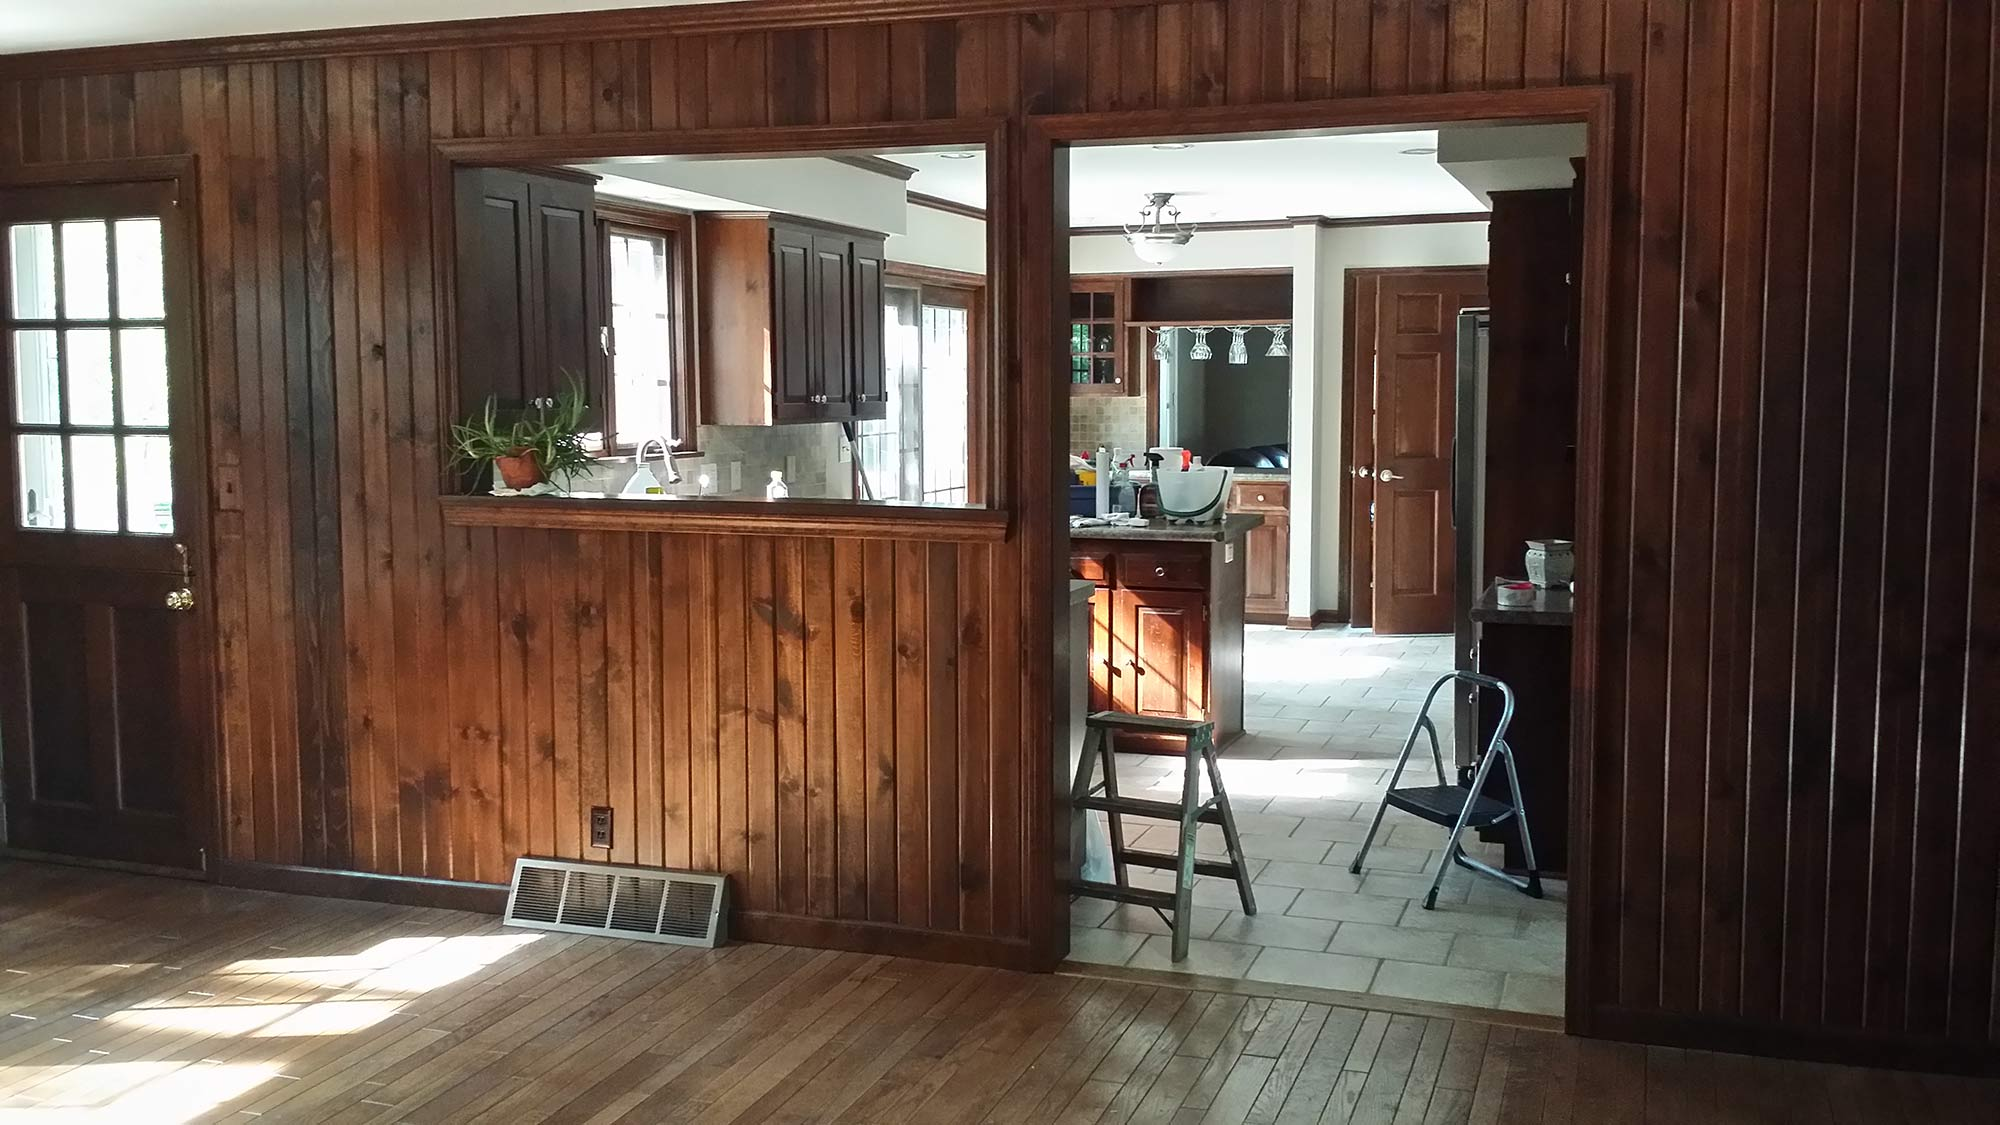 Woodridge den before staging